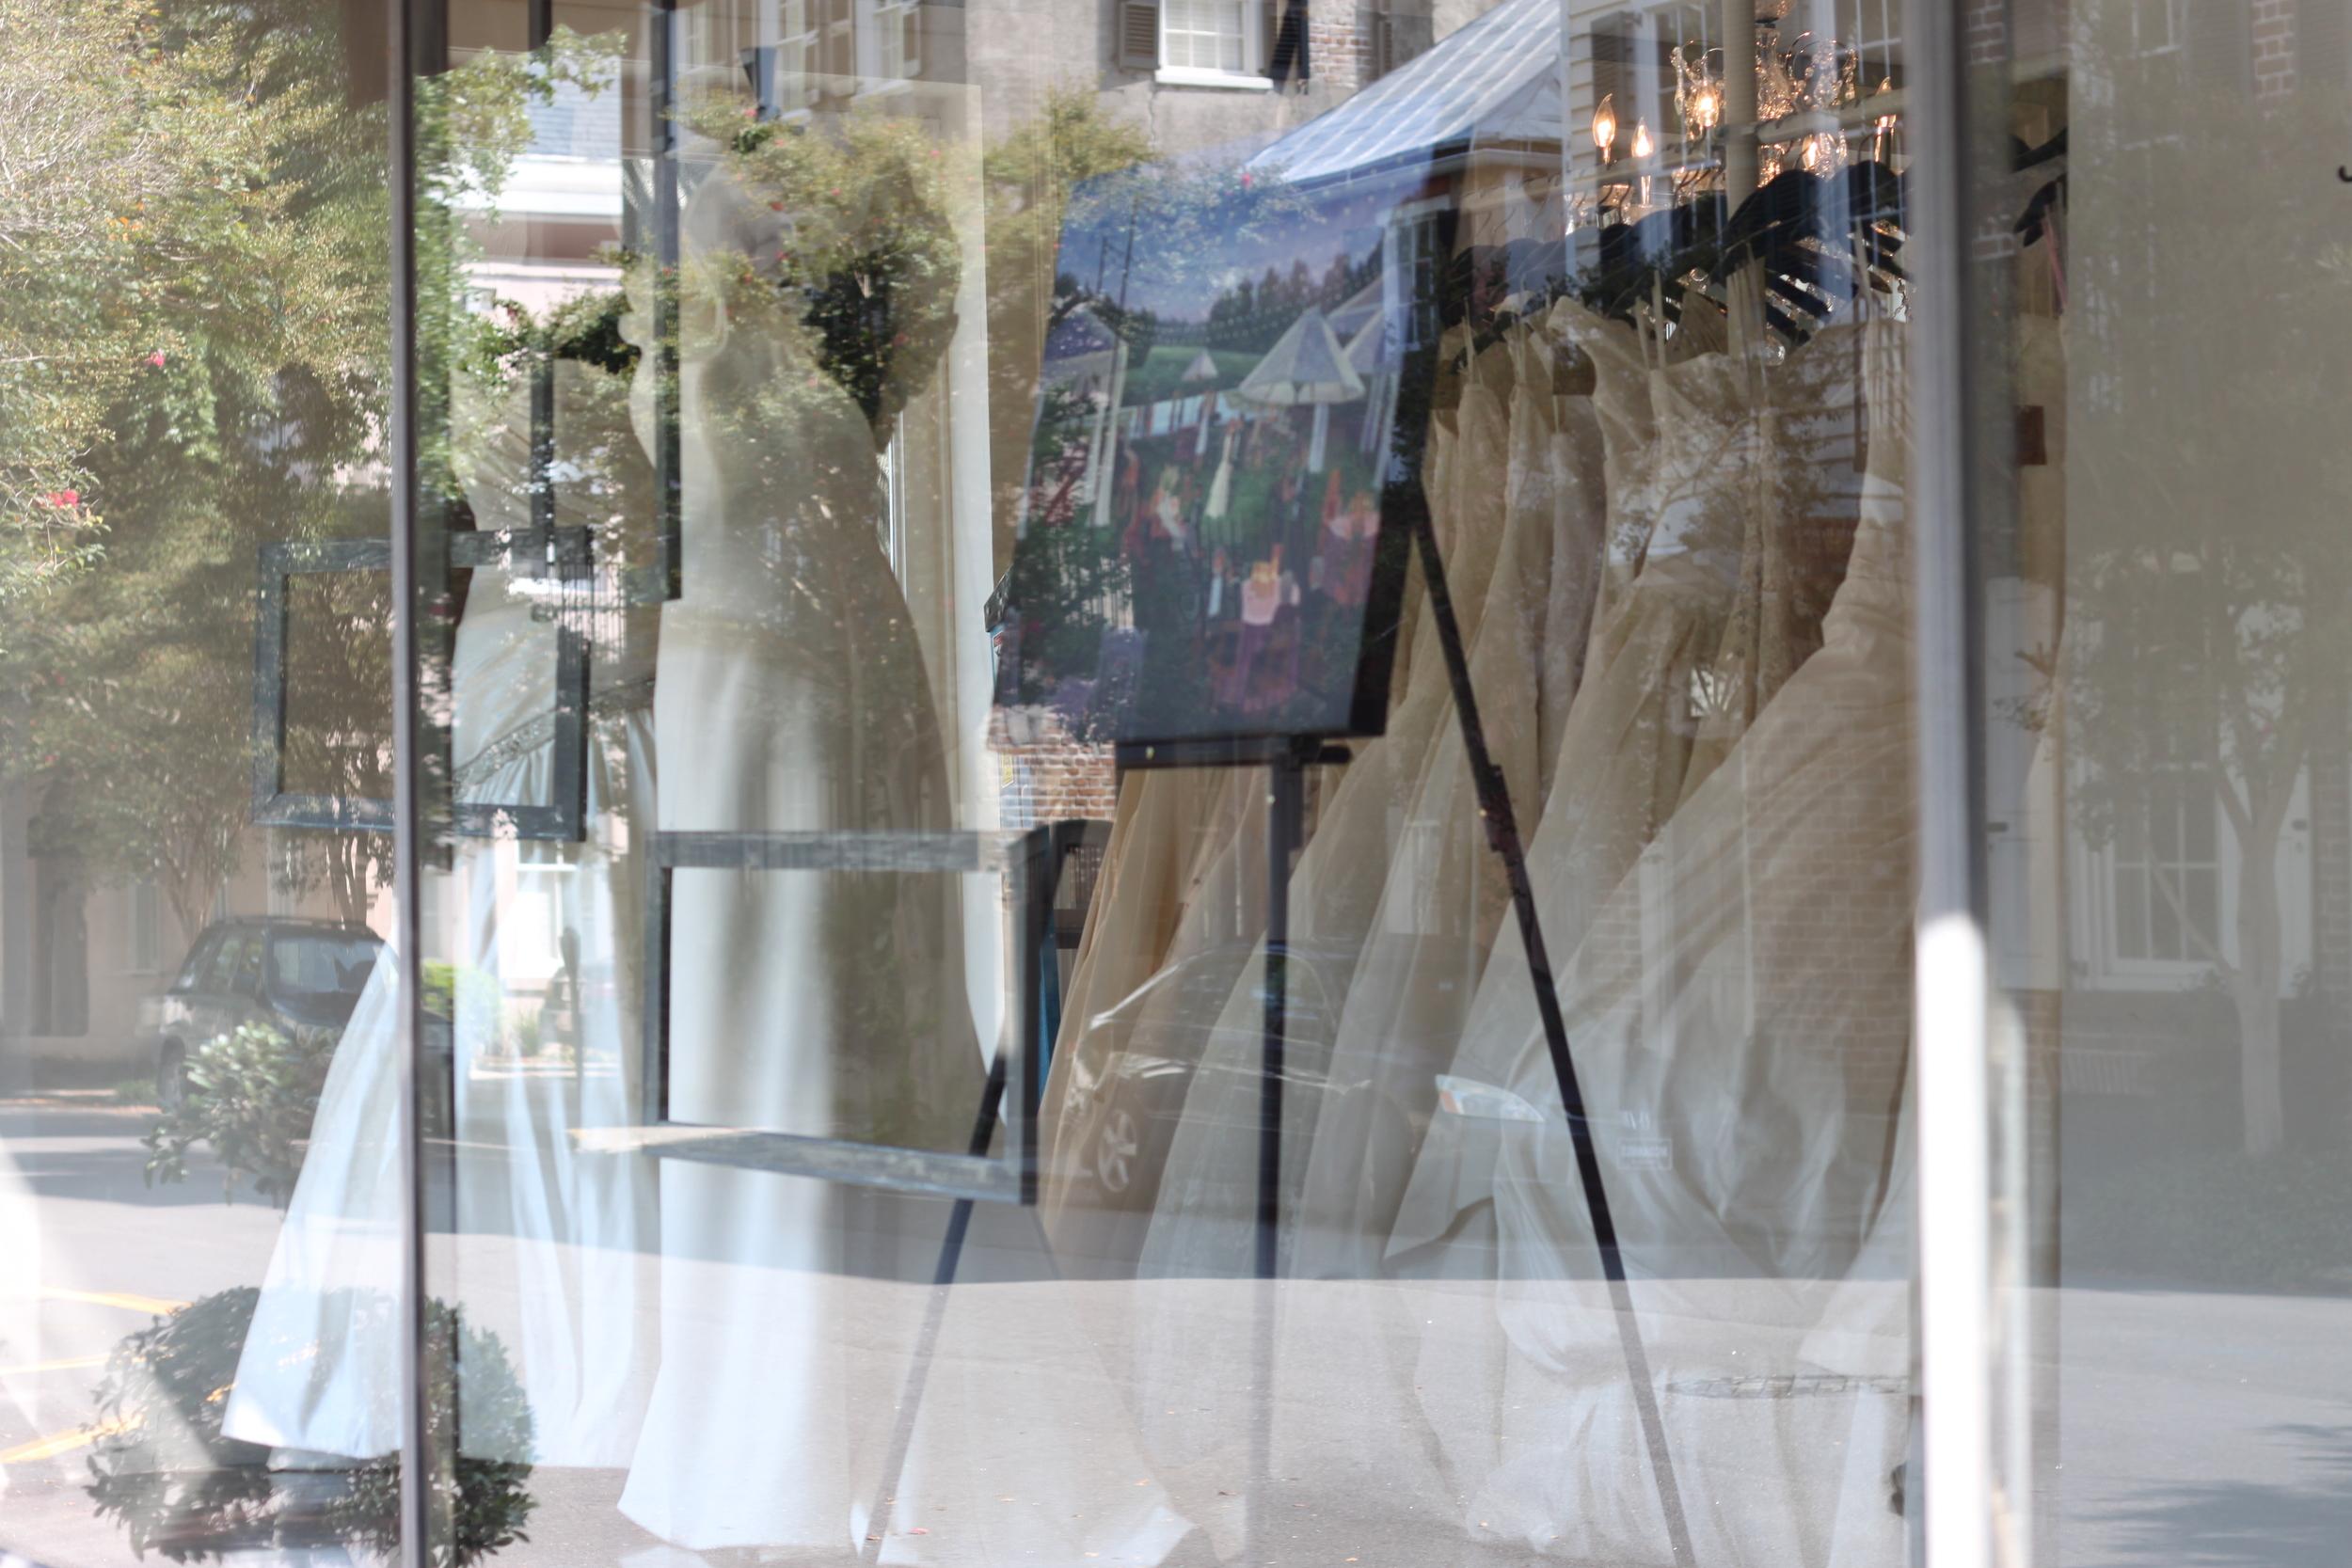 Fabulous Frocks + Wed on Canvas Window Display //